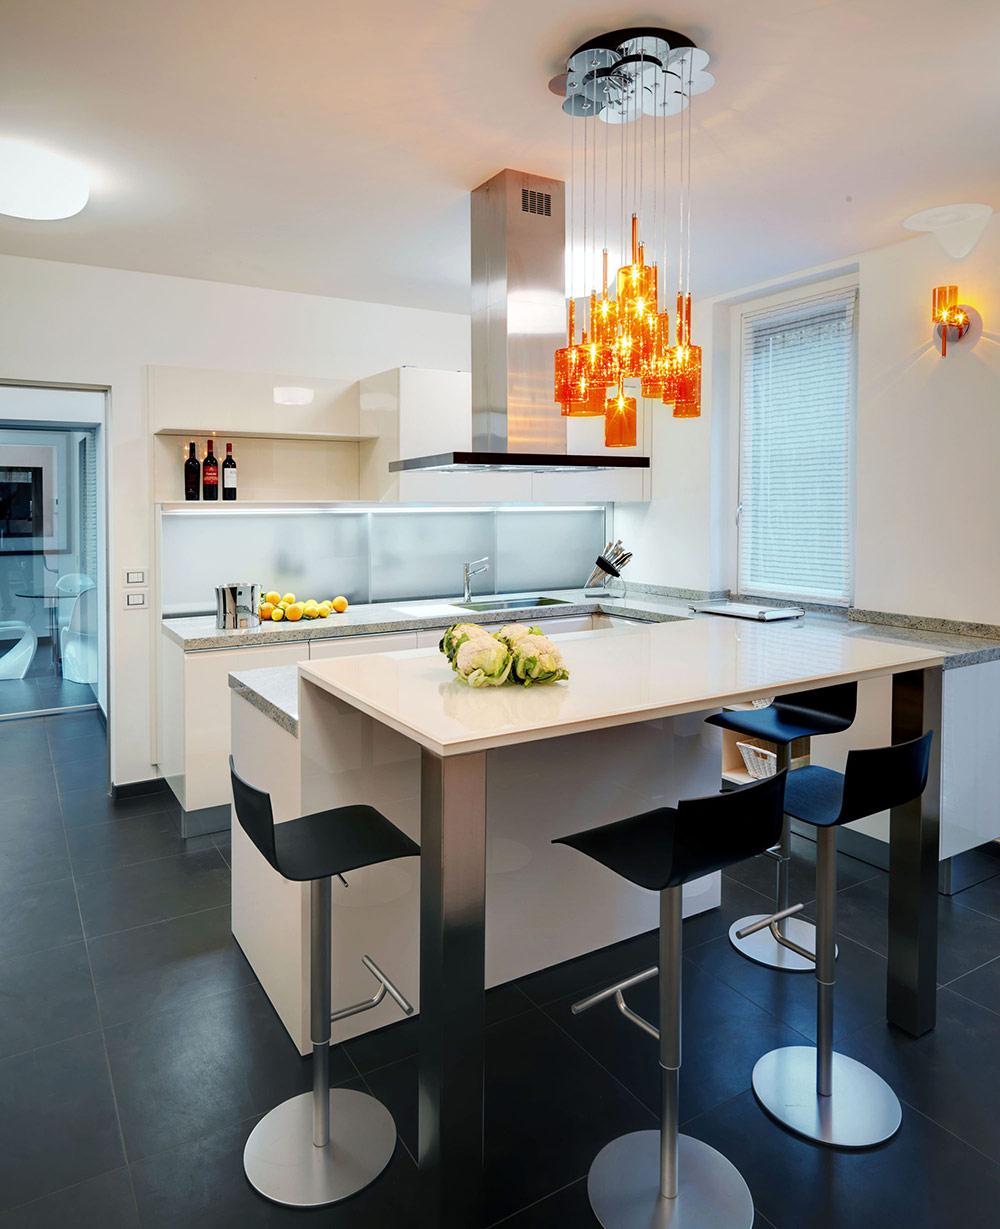 Kitchen, Orange Lighting, Villa on Lake Como by Studio Marco Piva